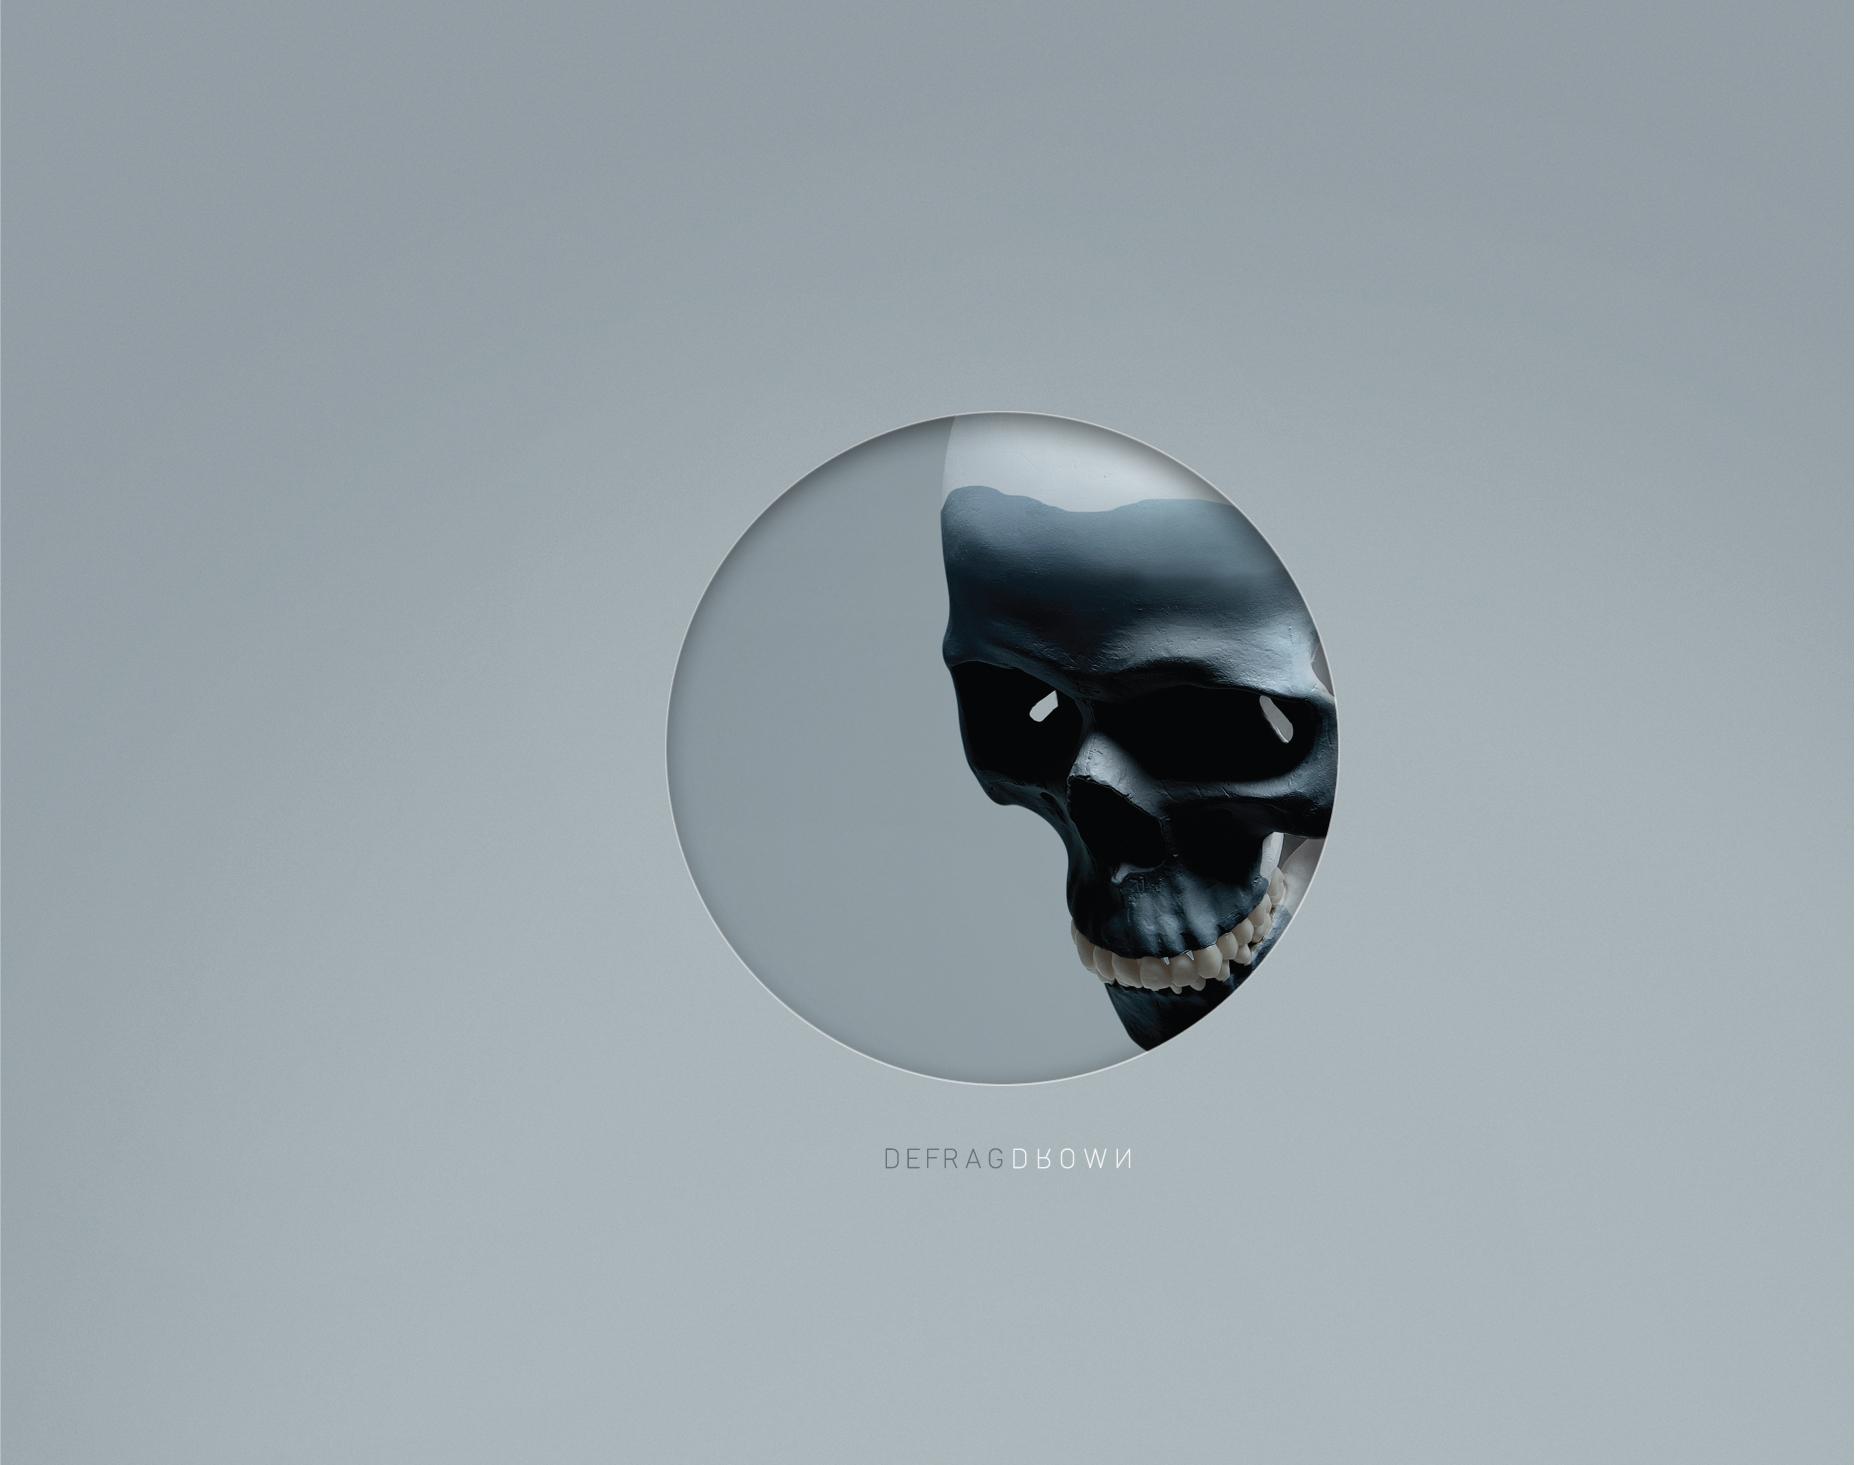 e824 cd-inlaycard_DEFRAG_INSIDE.jpg